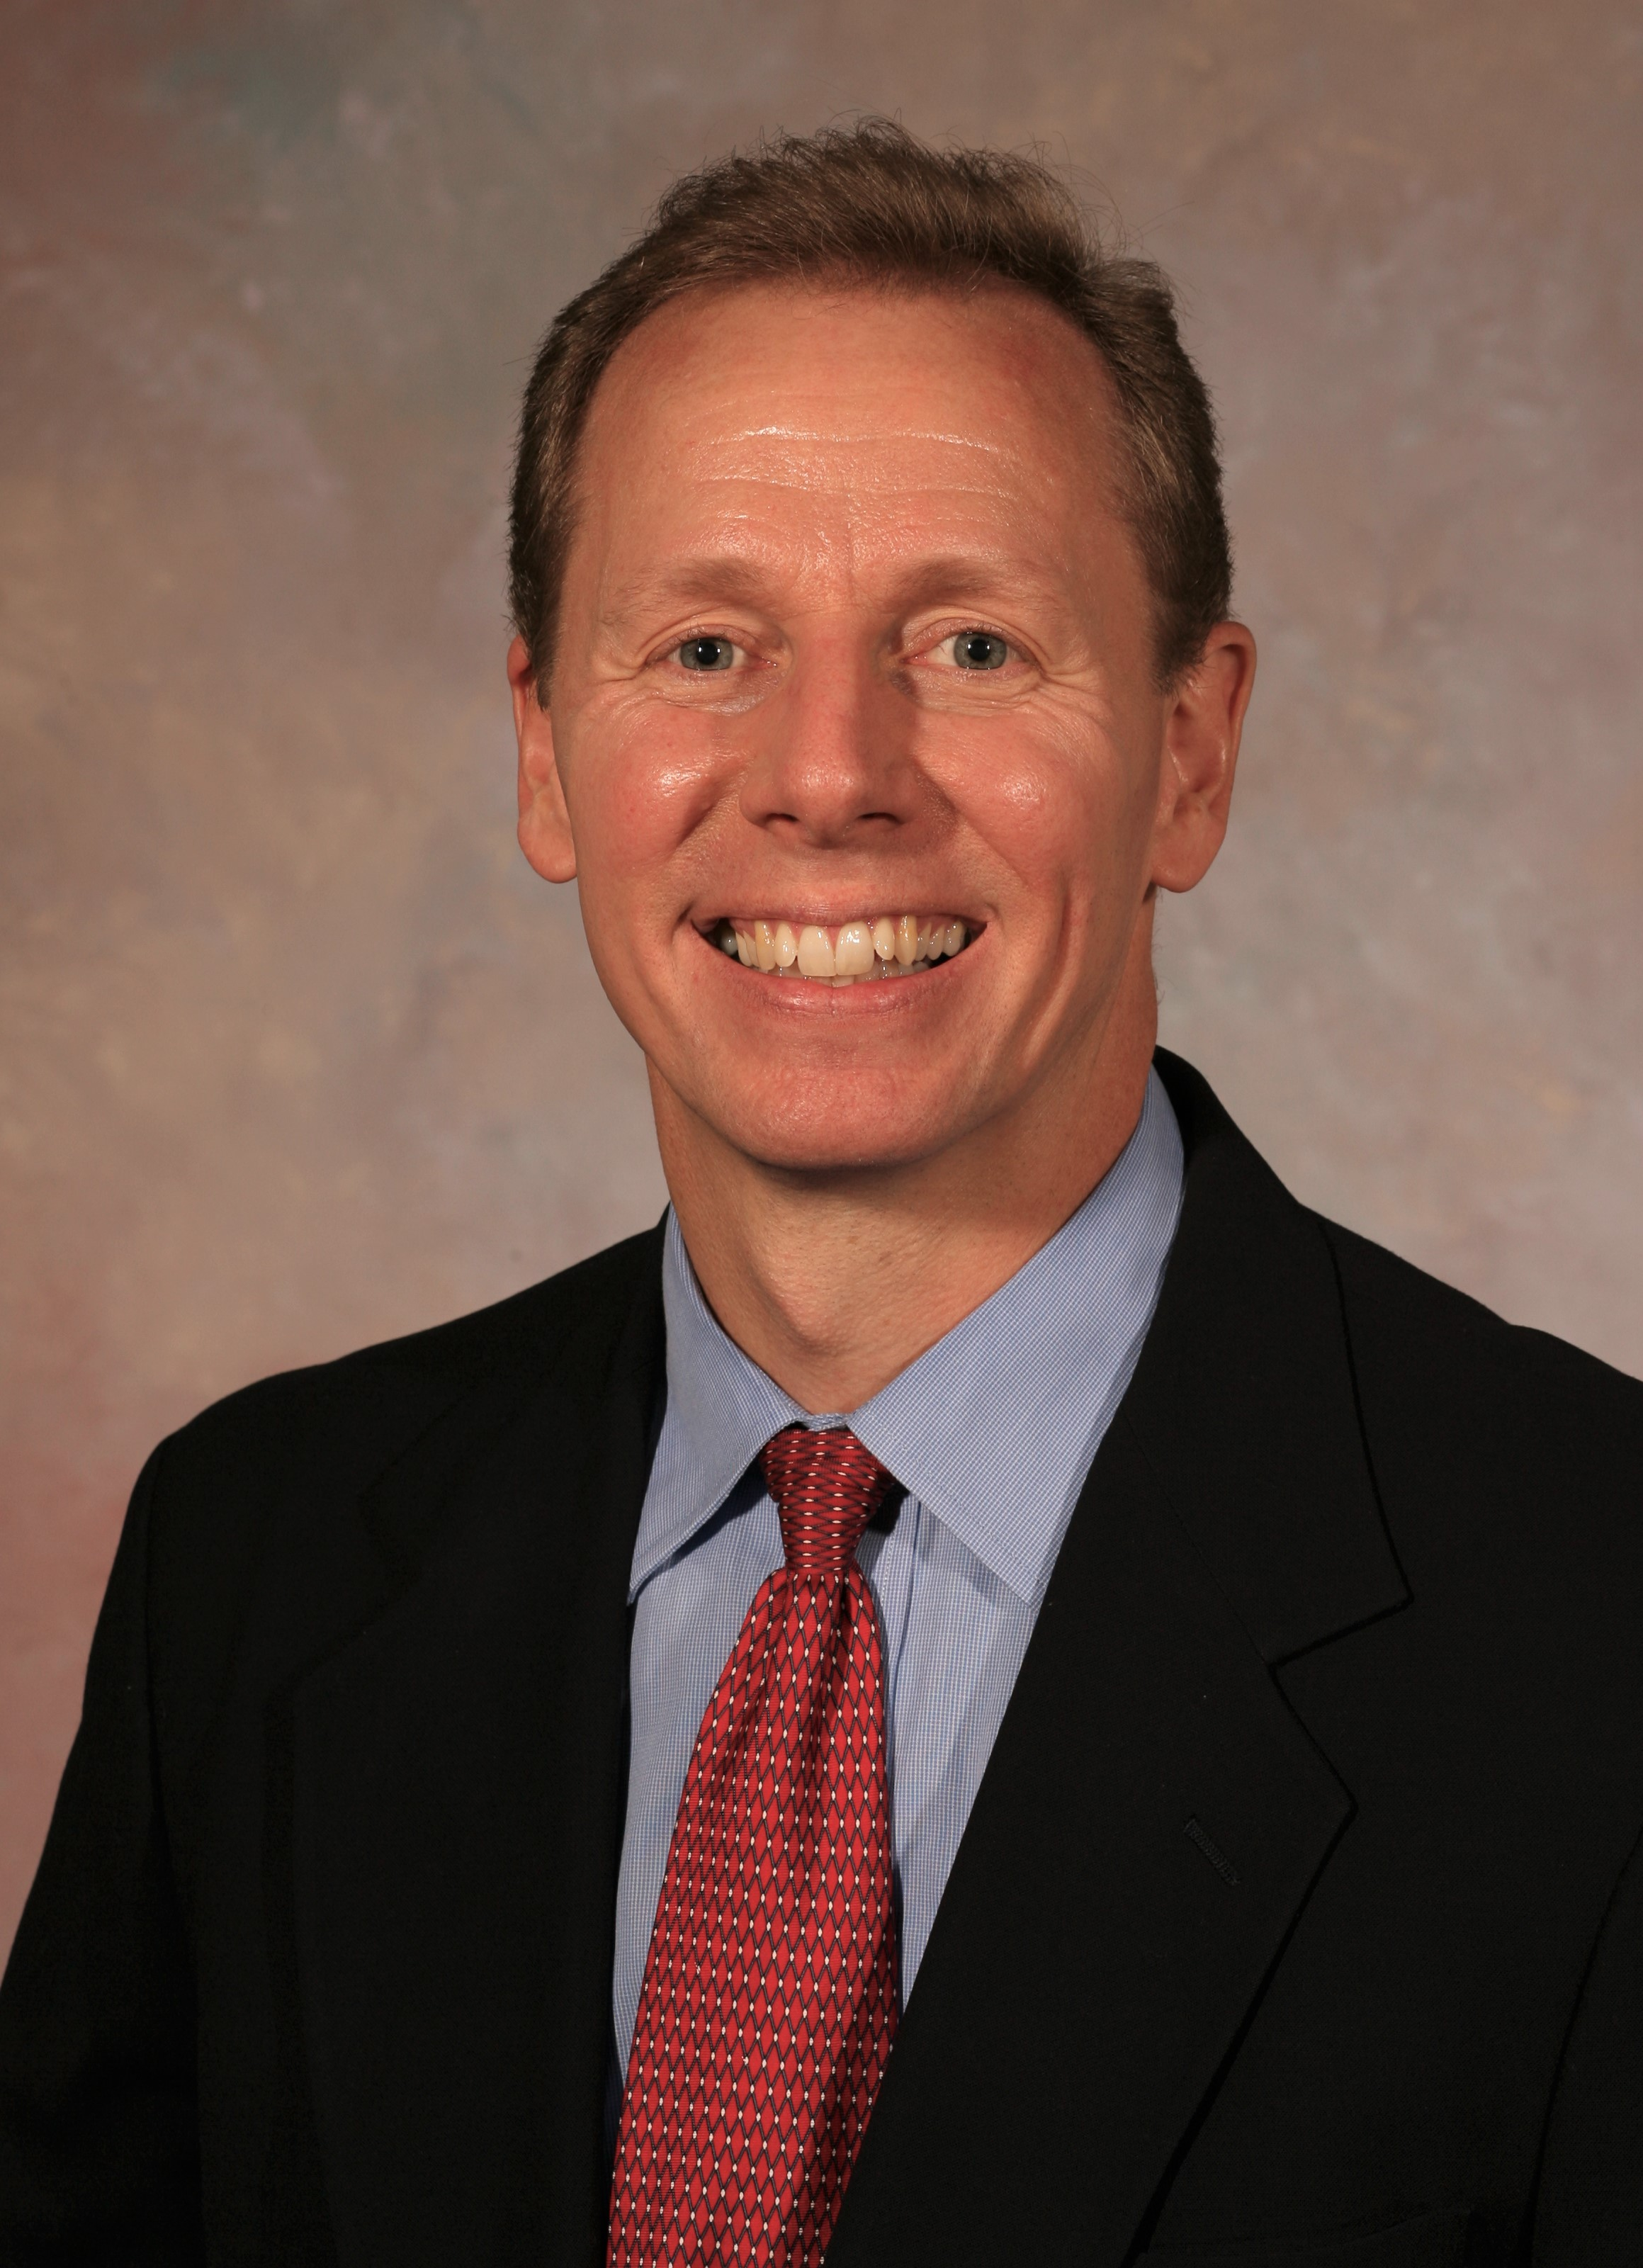 Dr. David Moseman